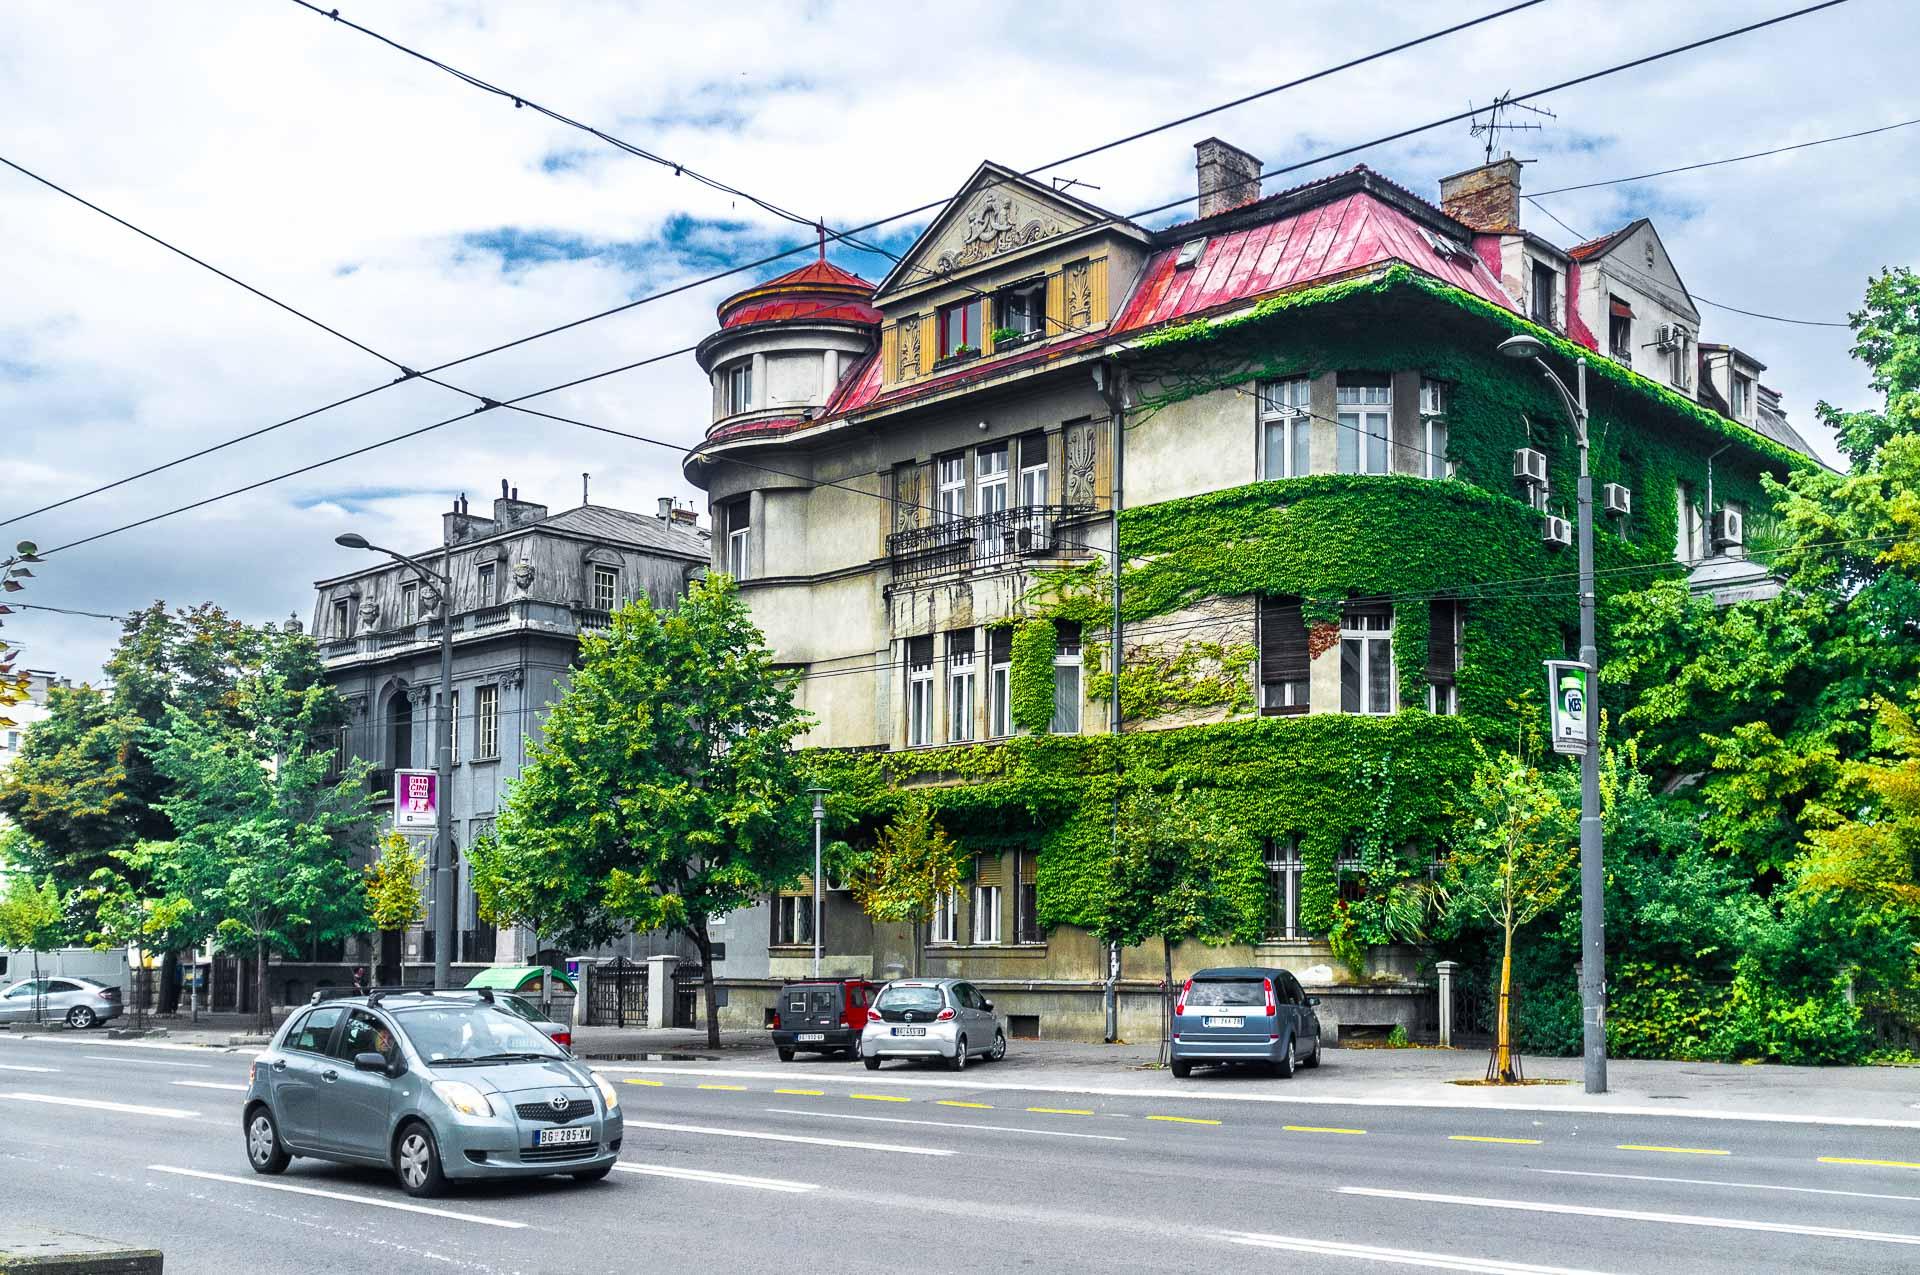 08-22-Beograd-05